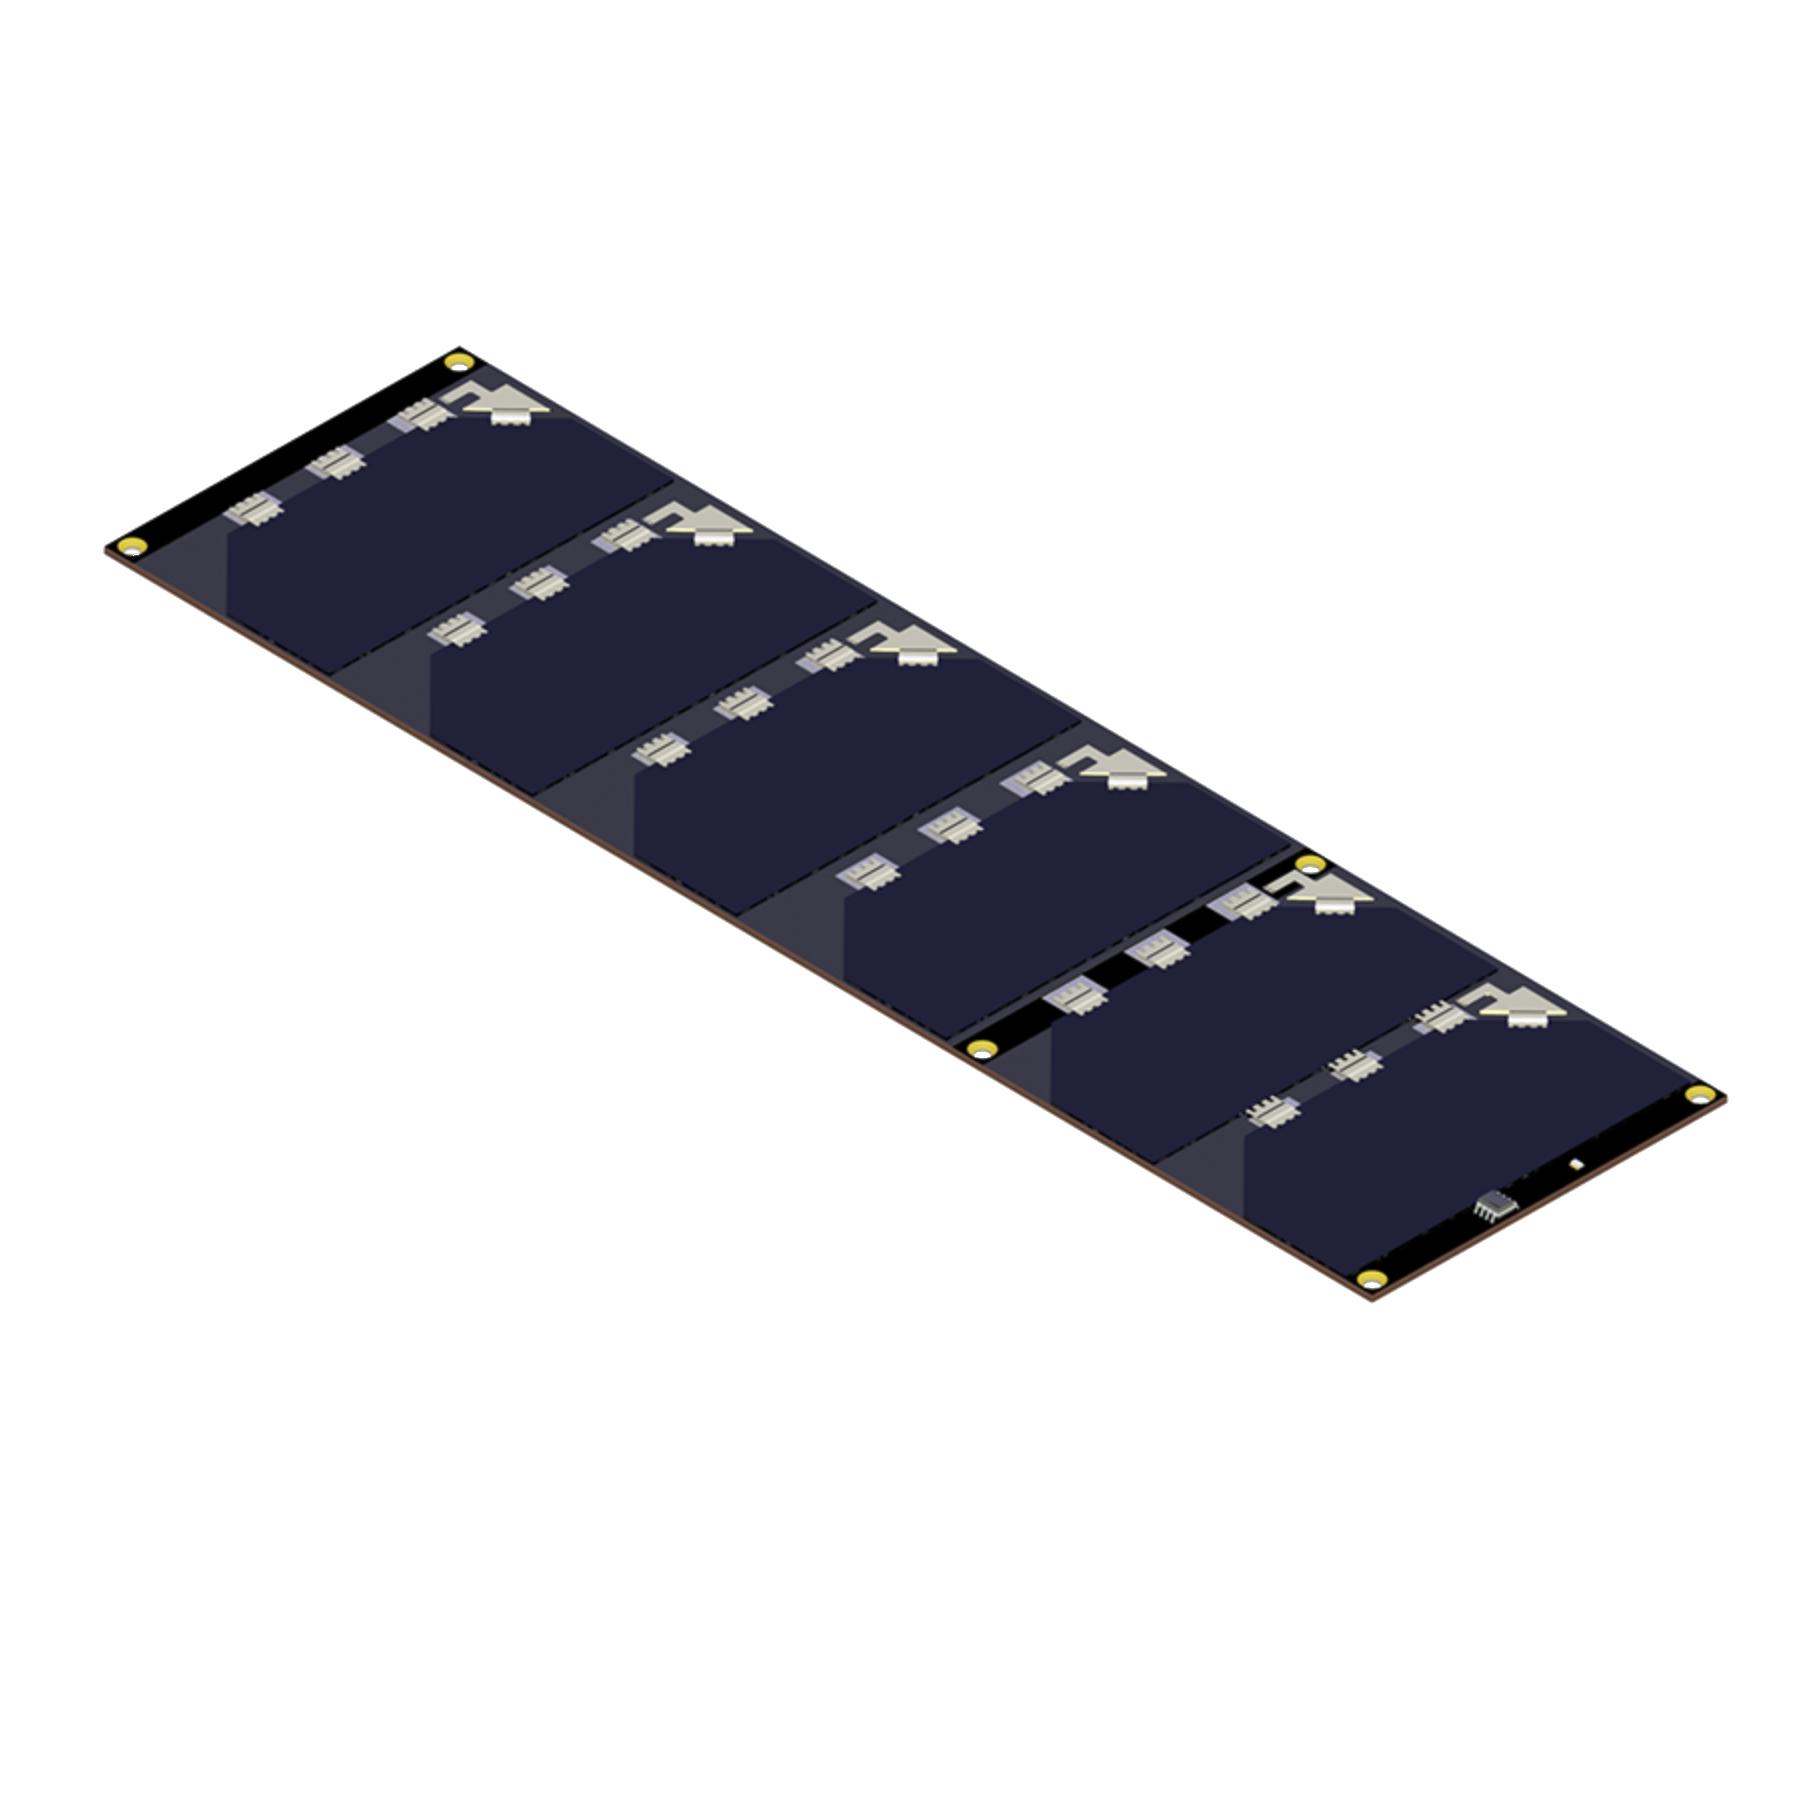 3U Cubesat Solar Panel